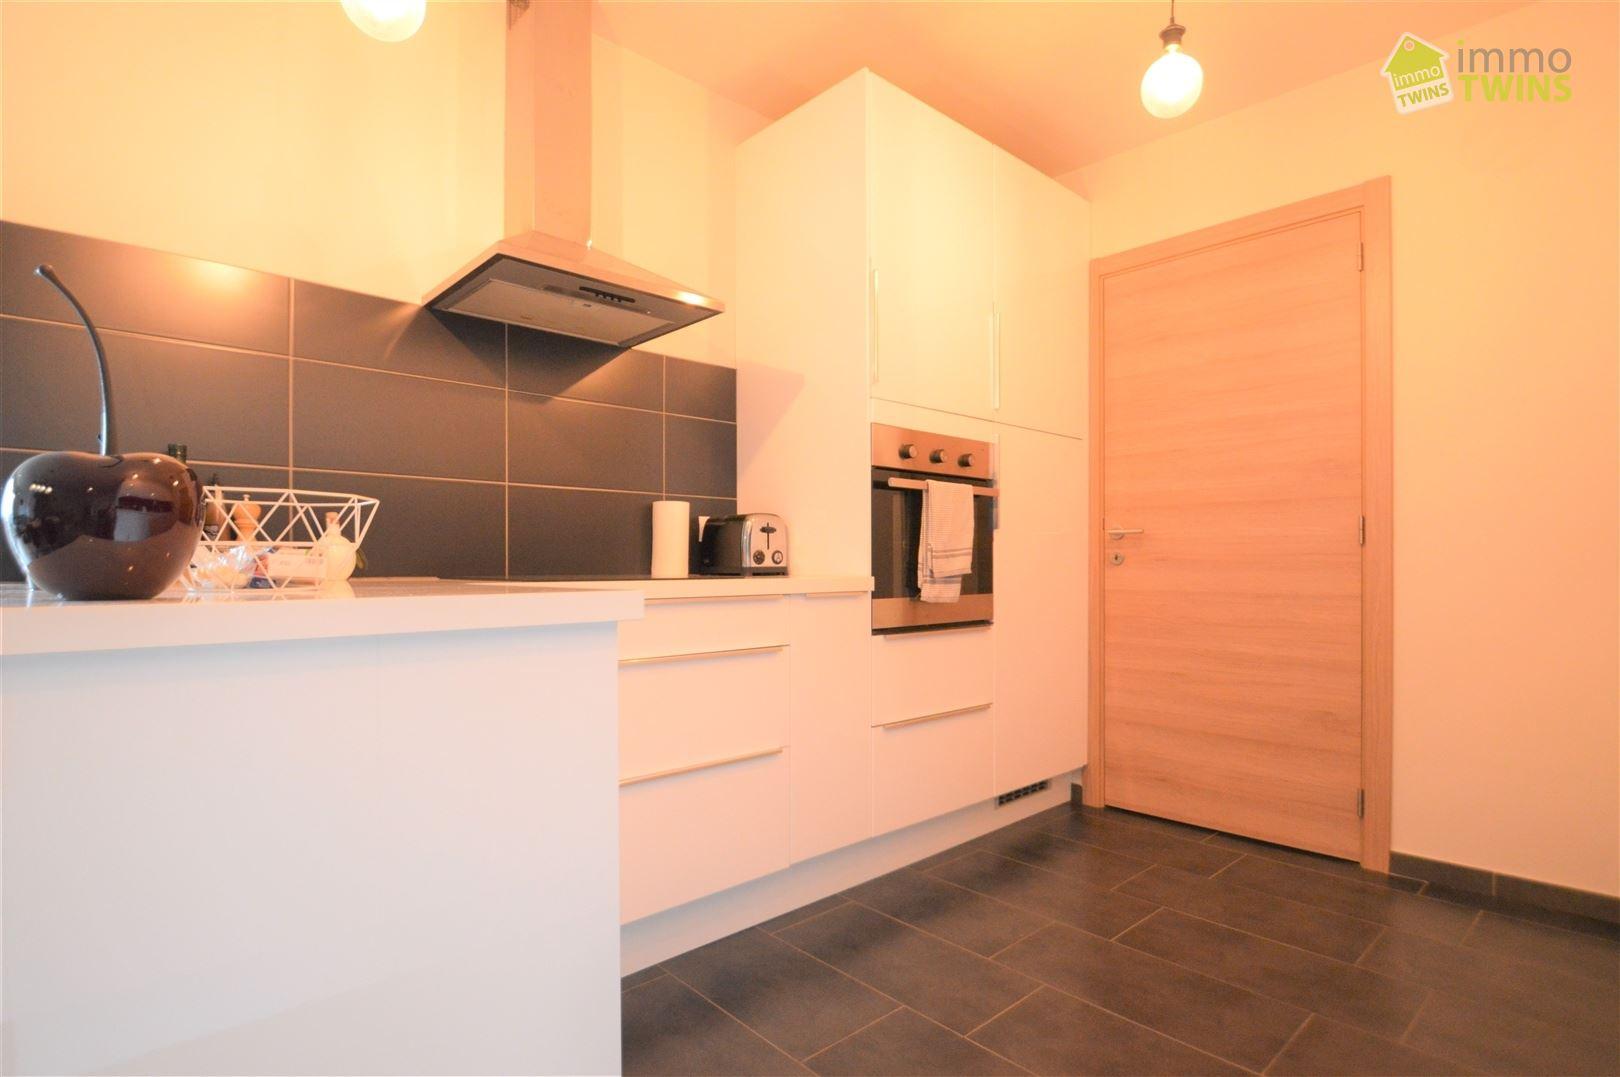 Foto 4 : Appartement te 9200 SINT-GILLIS-DENDERMONDE (België) - Prijs € 835